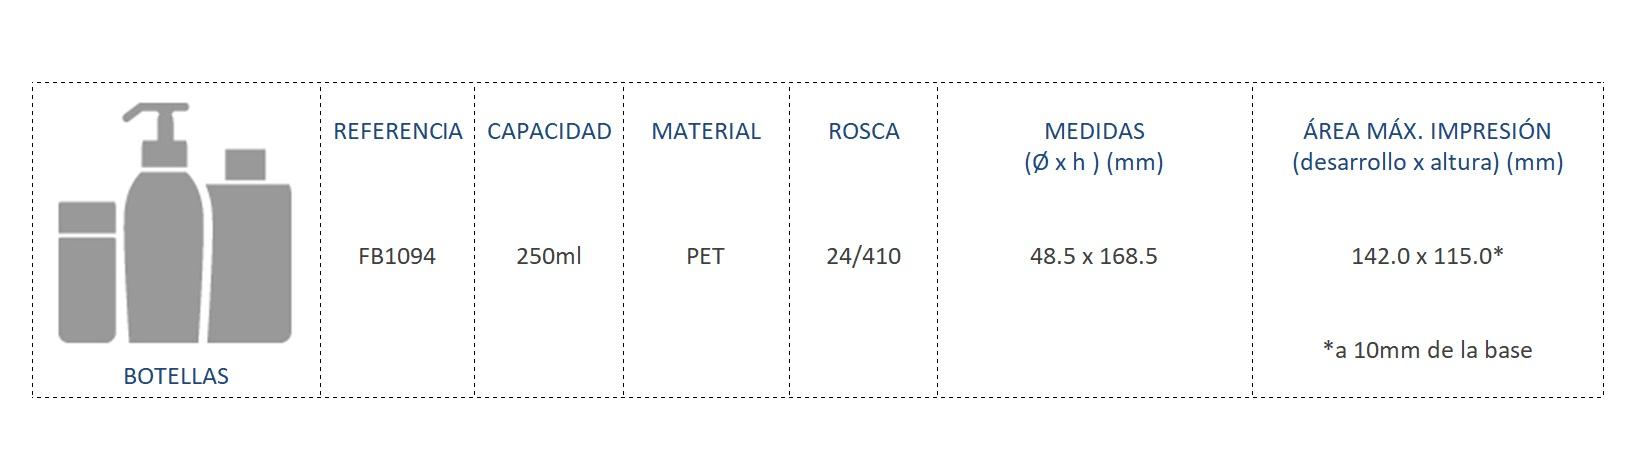 Cuadro de materiales botella FB1094